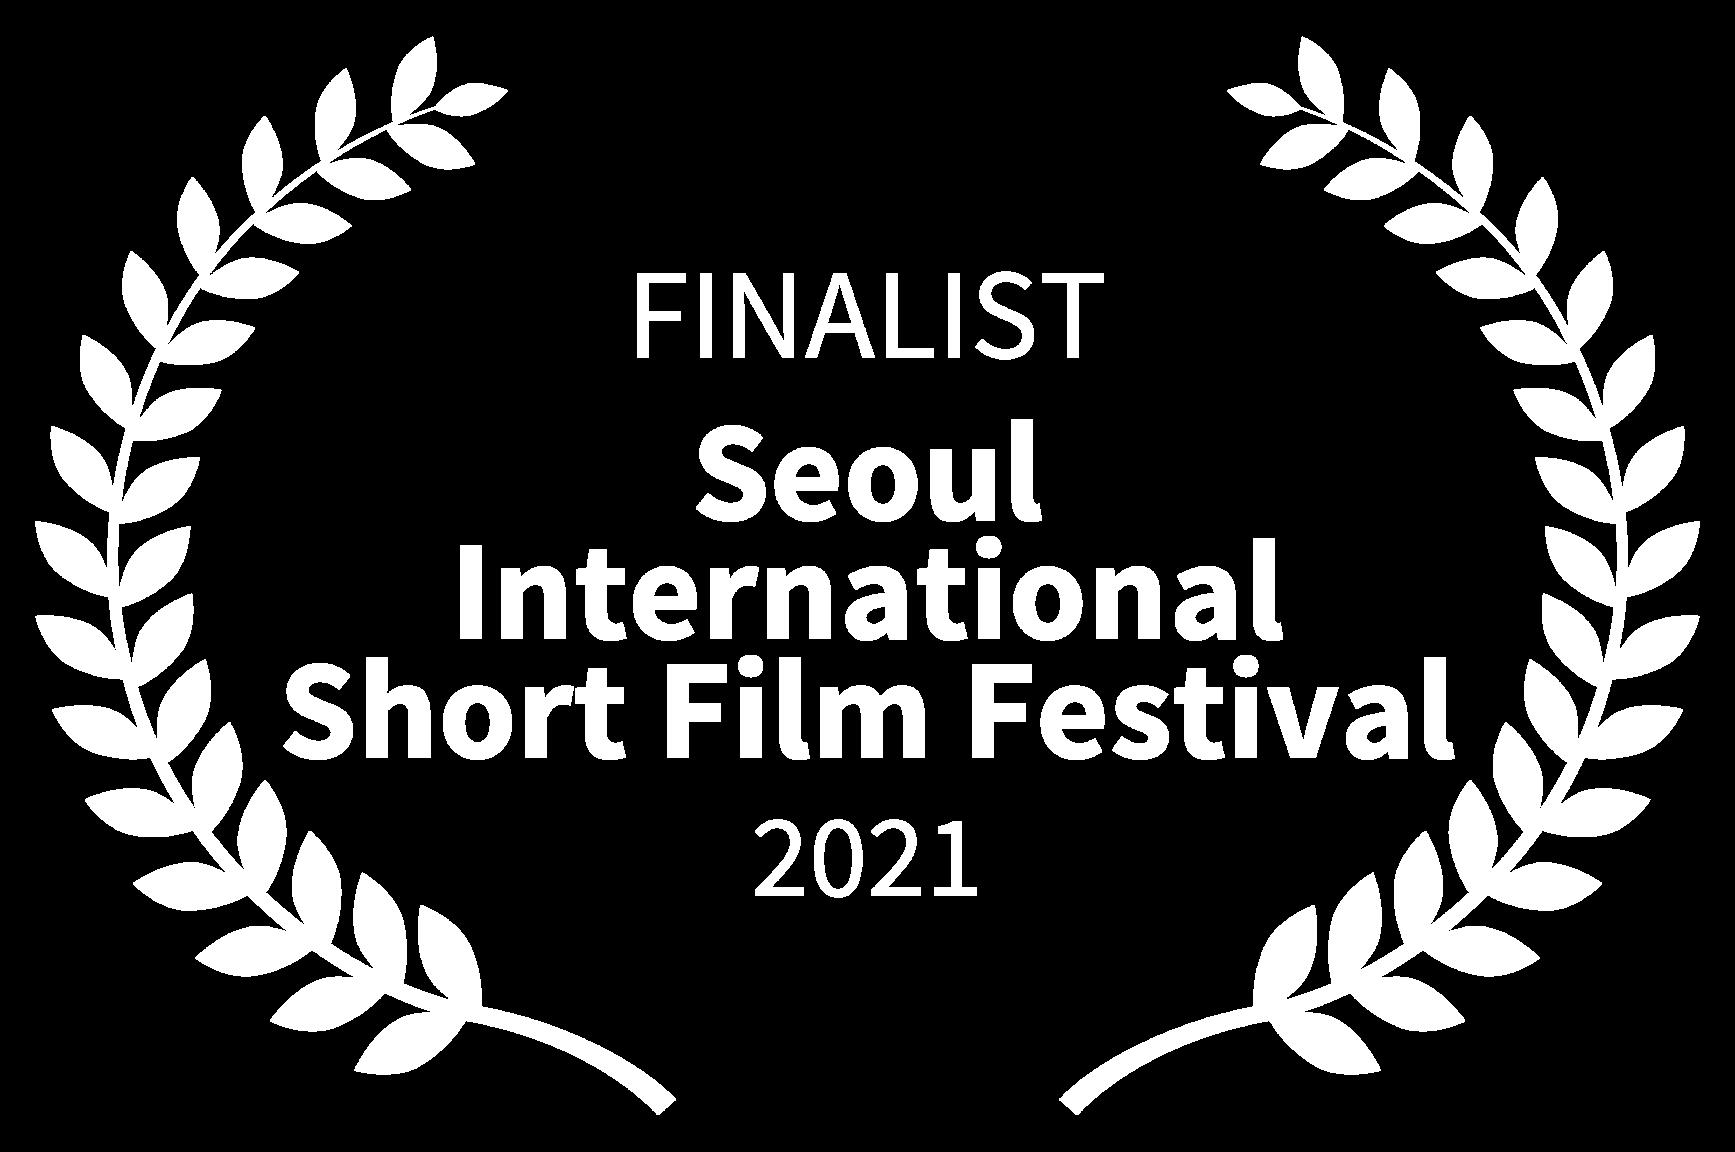 FINALIST - Seoul International Short Film Festival - 2021